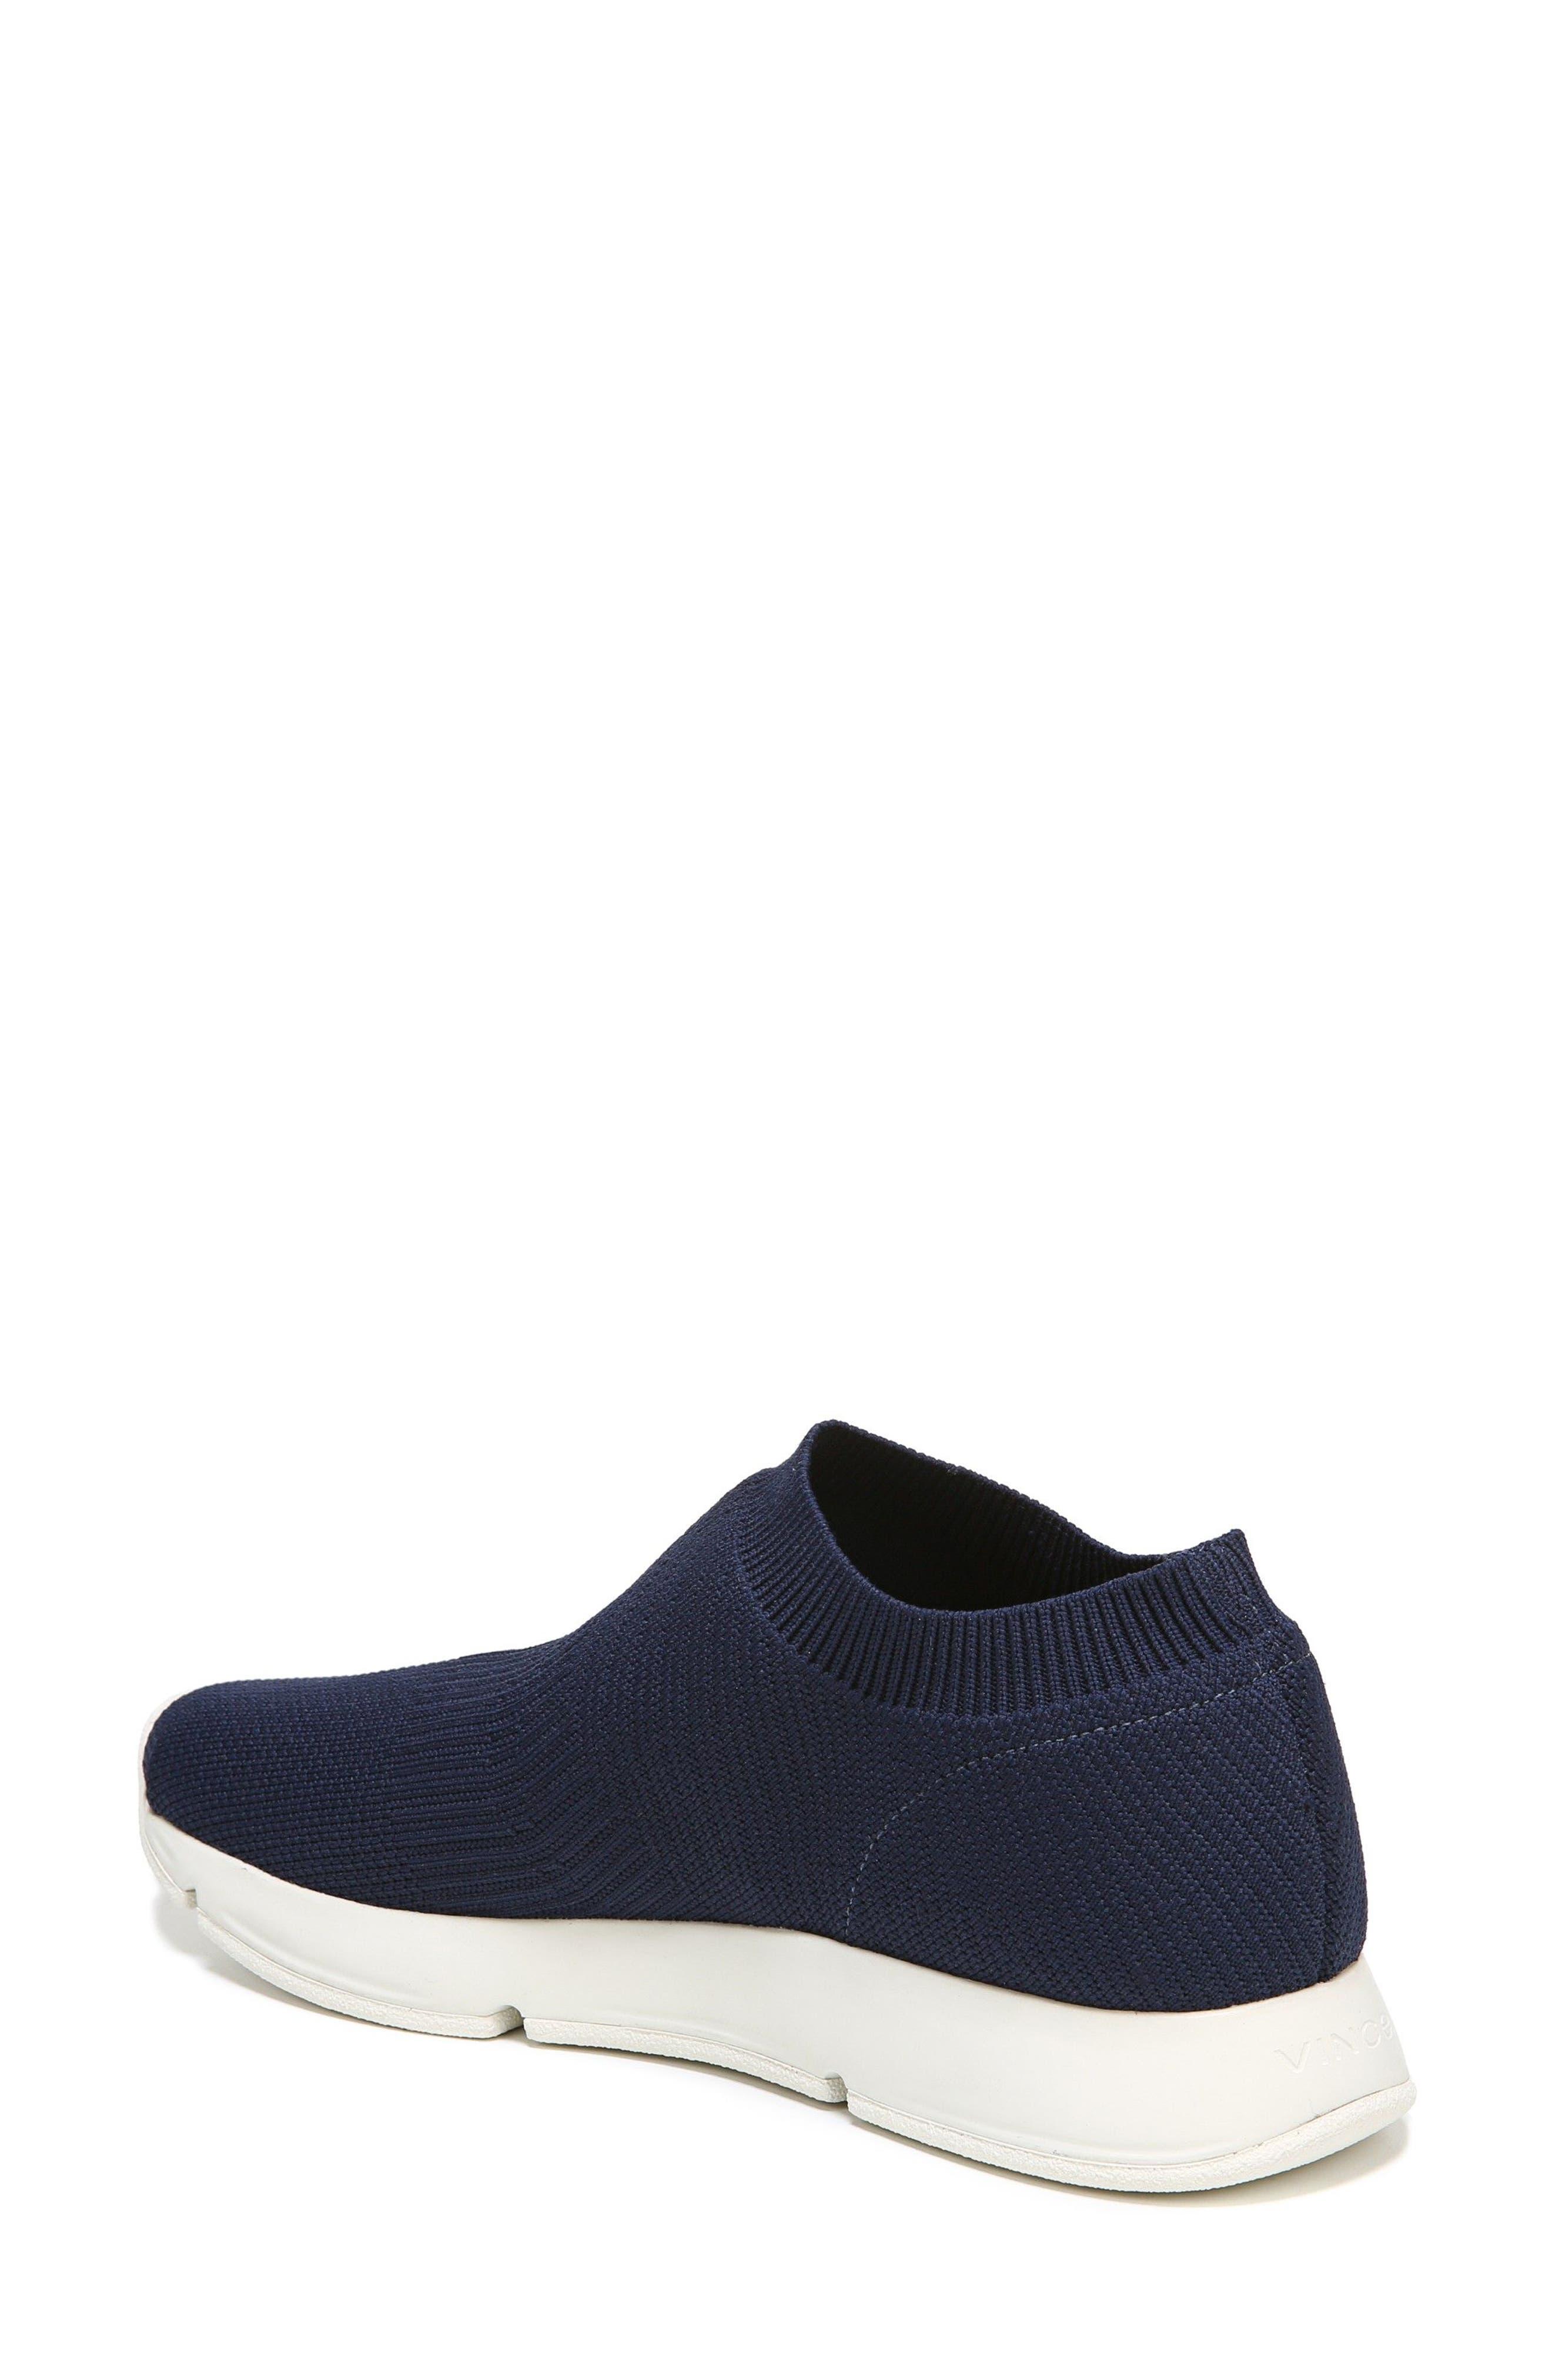 Theroux Slip-On Knit Sneaker,                             Alternate thumbnail 2, color,                             Navy